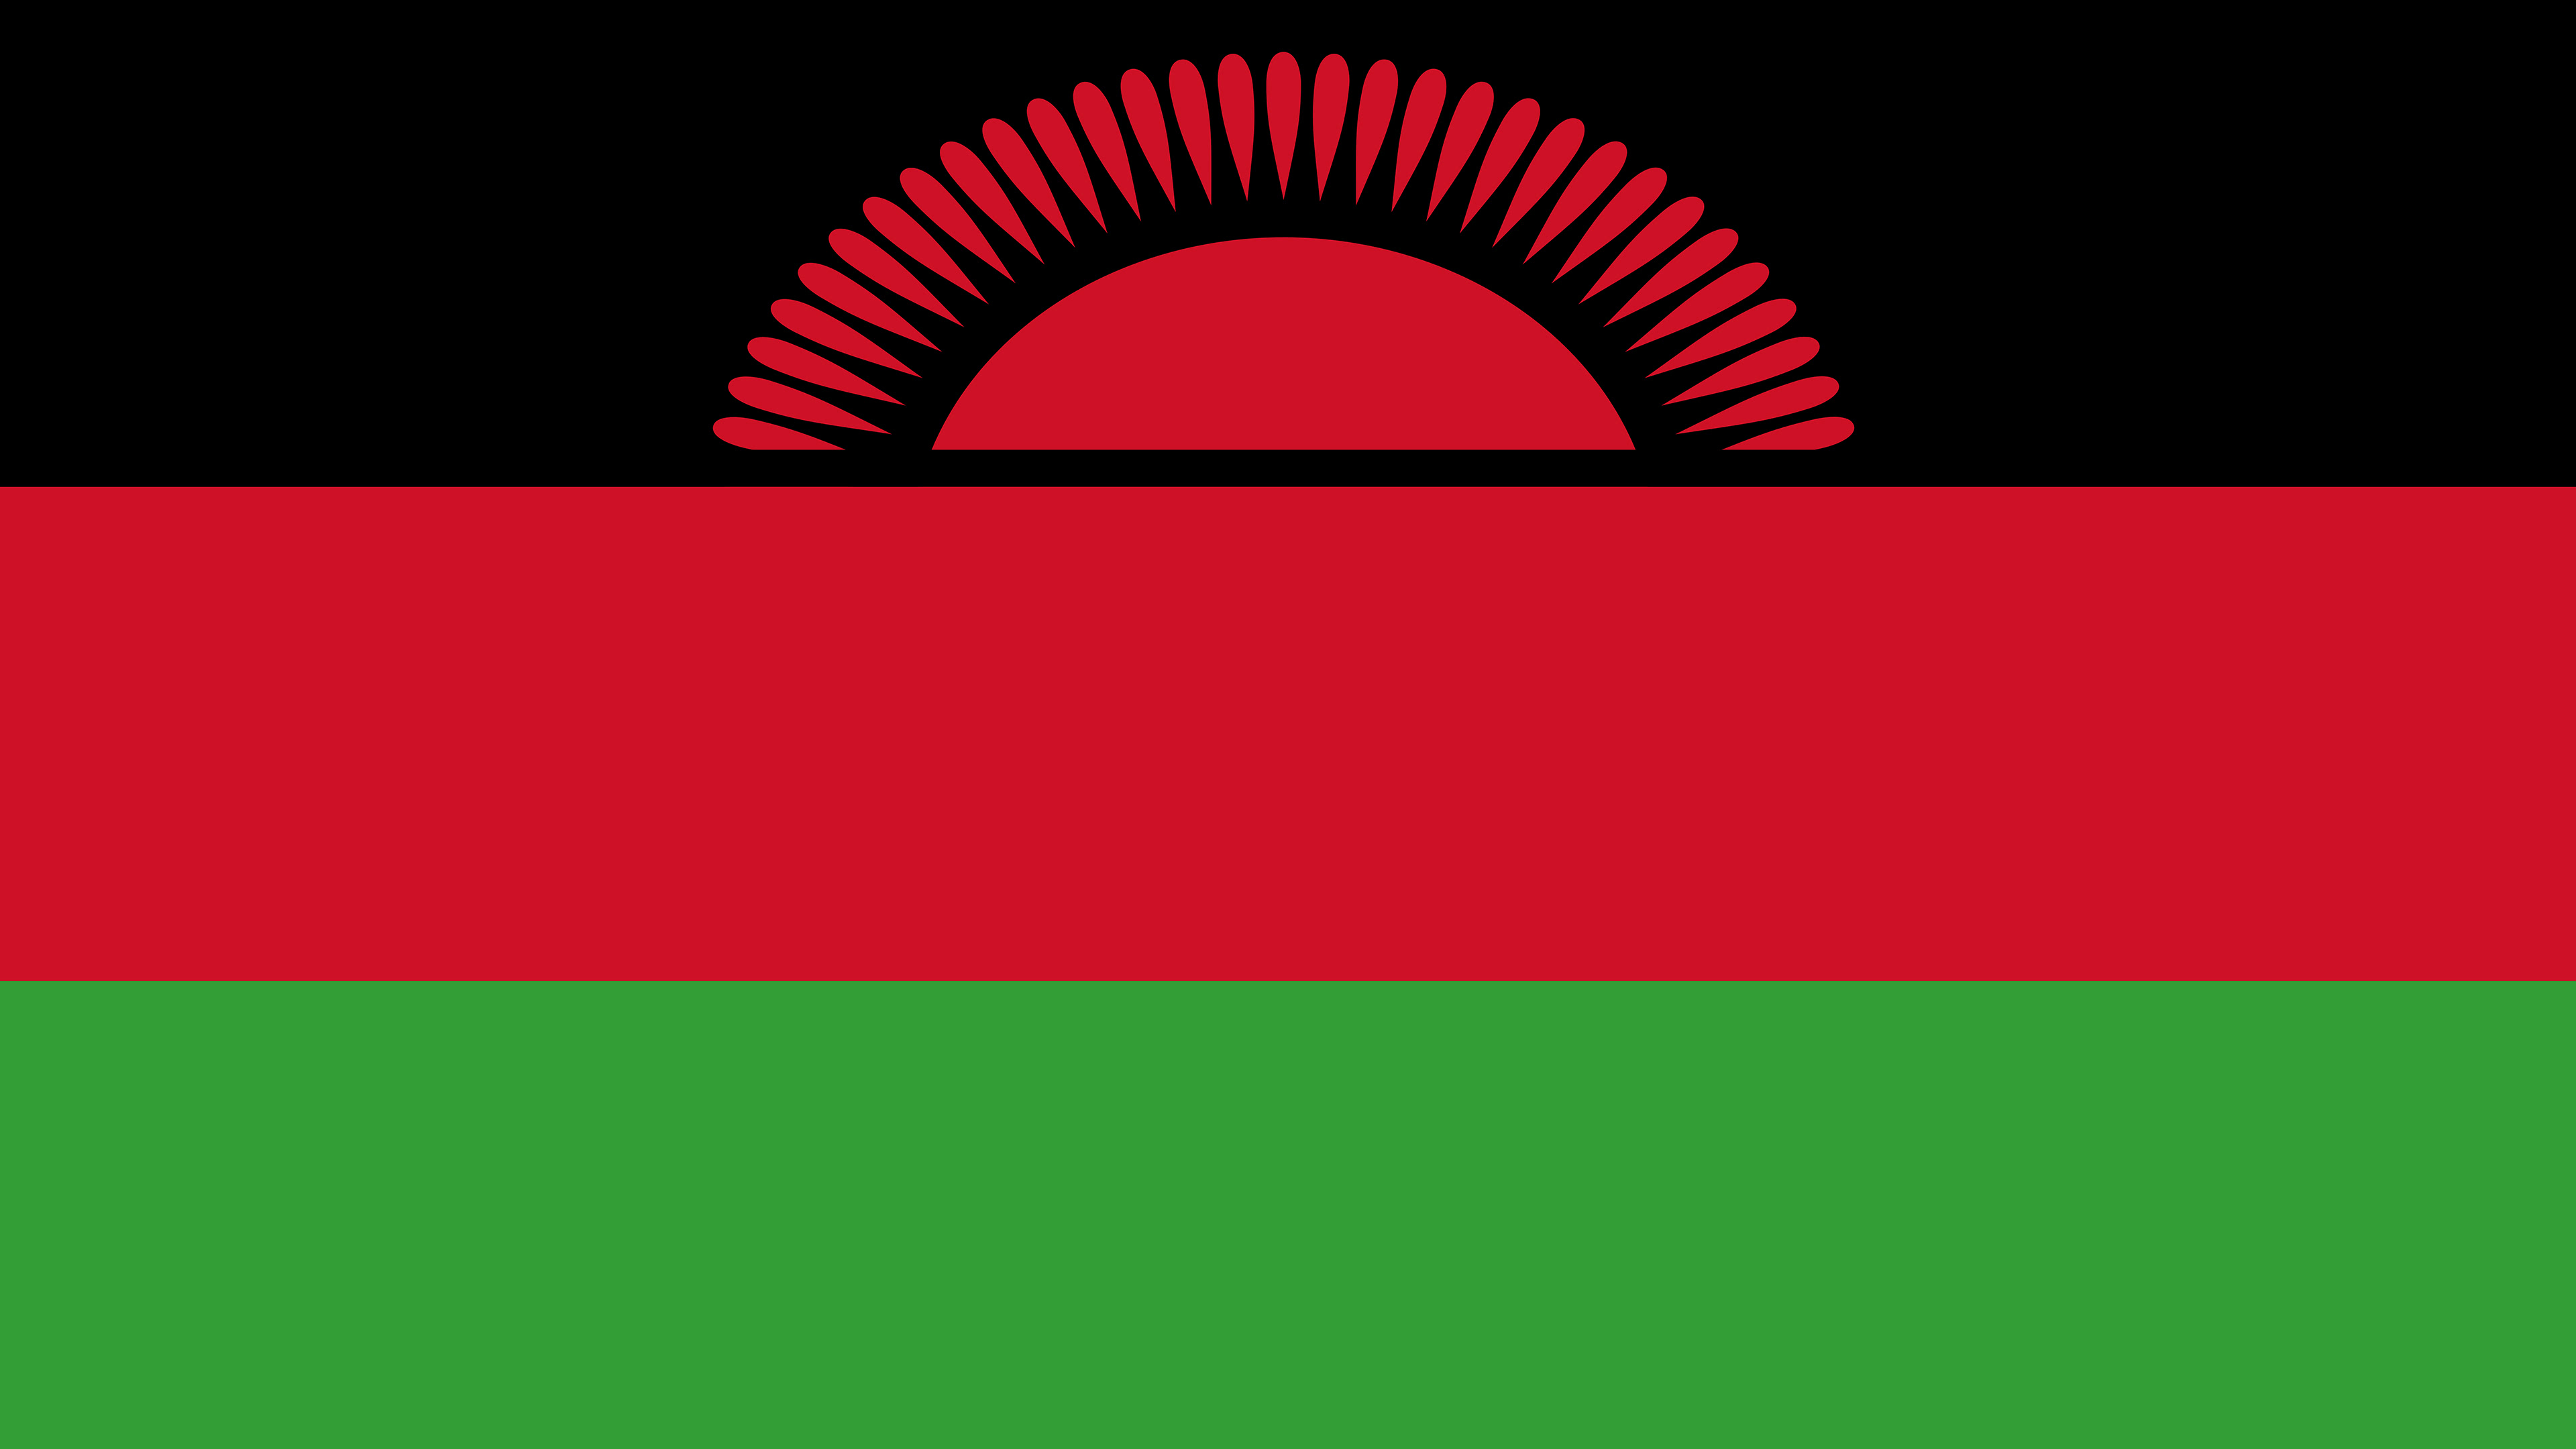 malawi flag uhd 4k wallpaper